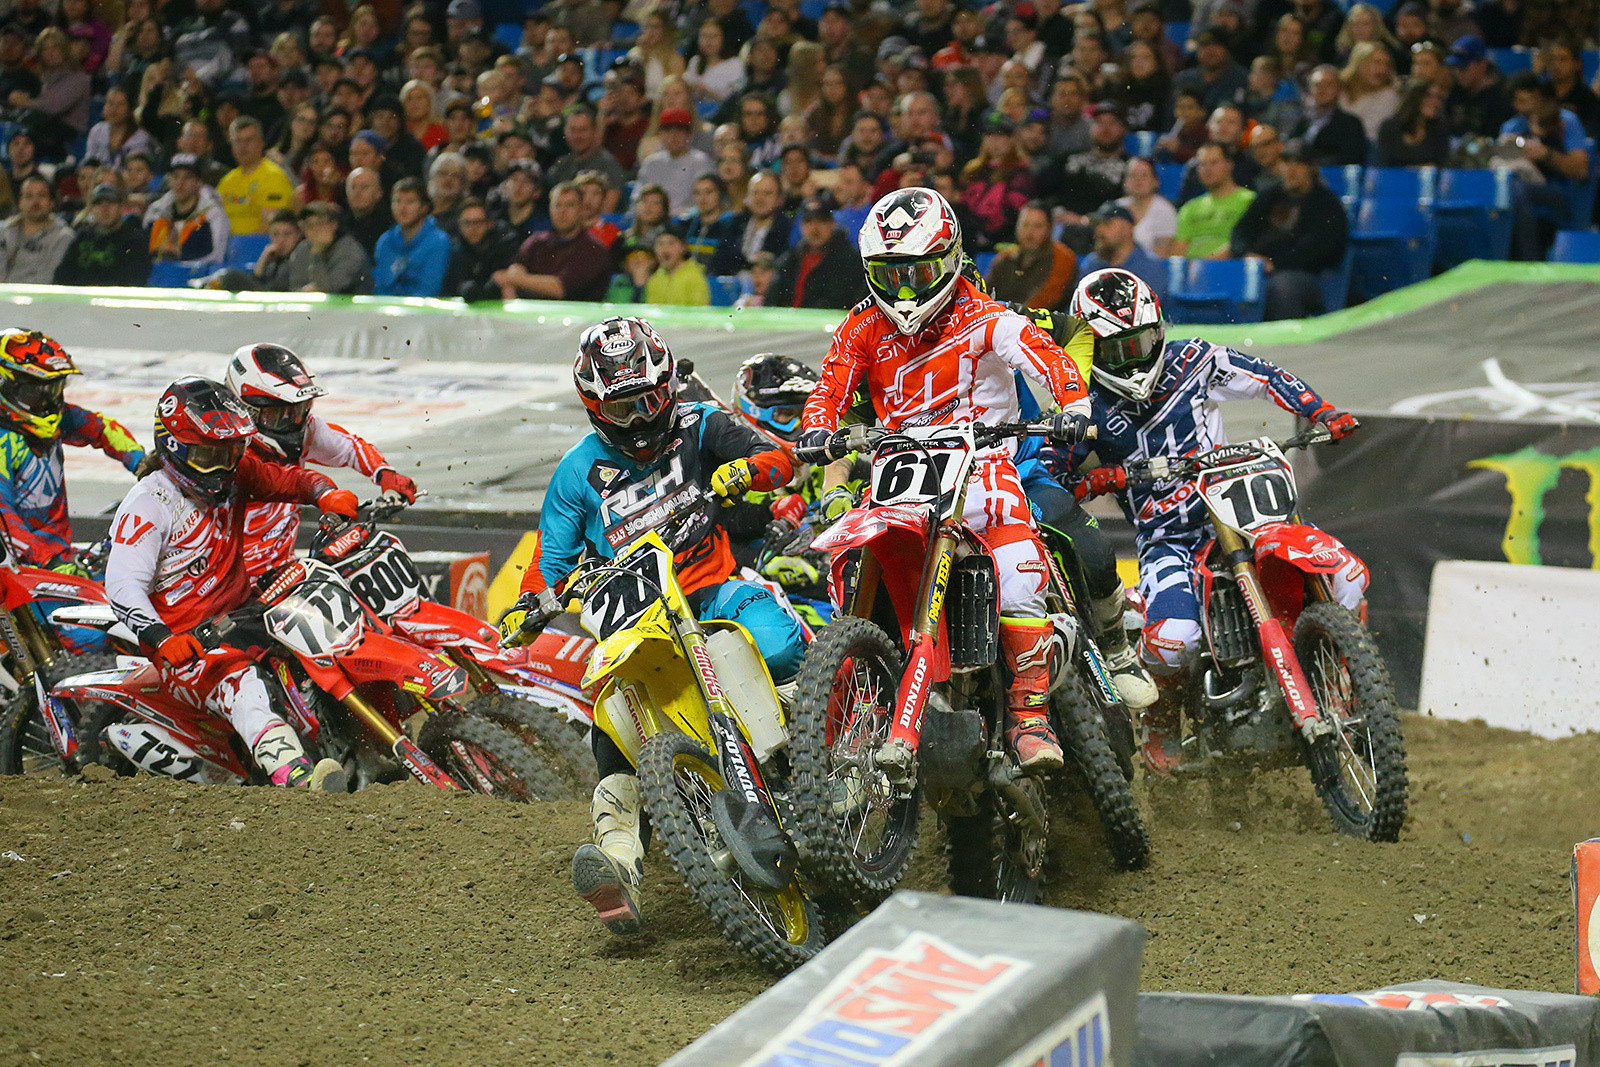 450 Semi Two Start - Photo Blast: Toronto - Motocross Pictures - Vital MX